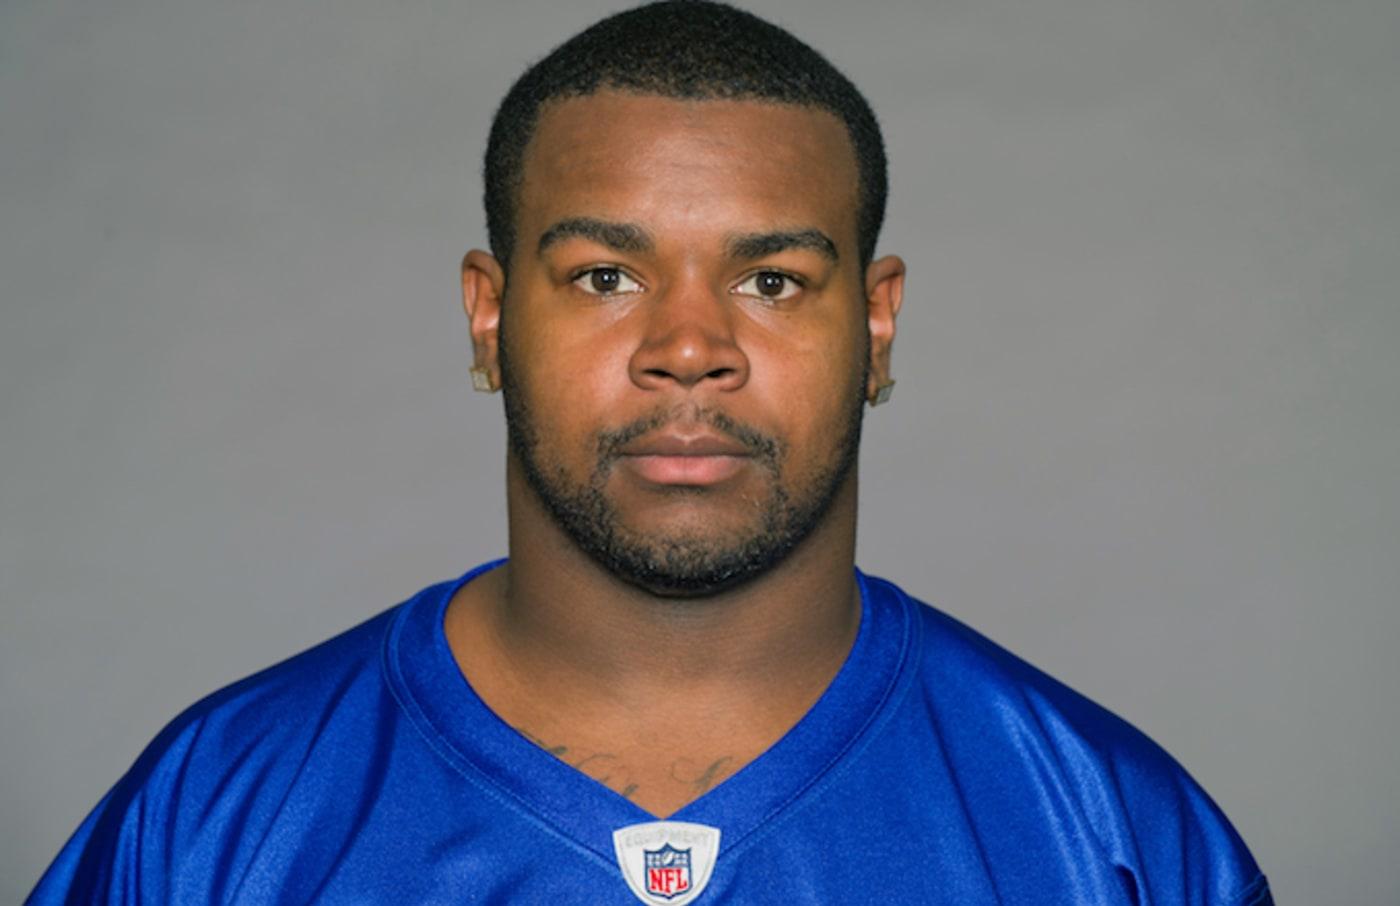 Robert Eddins, formerly of the Buffalo Bills.